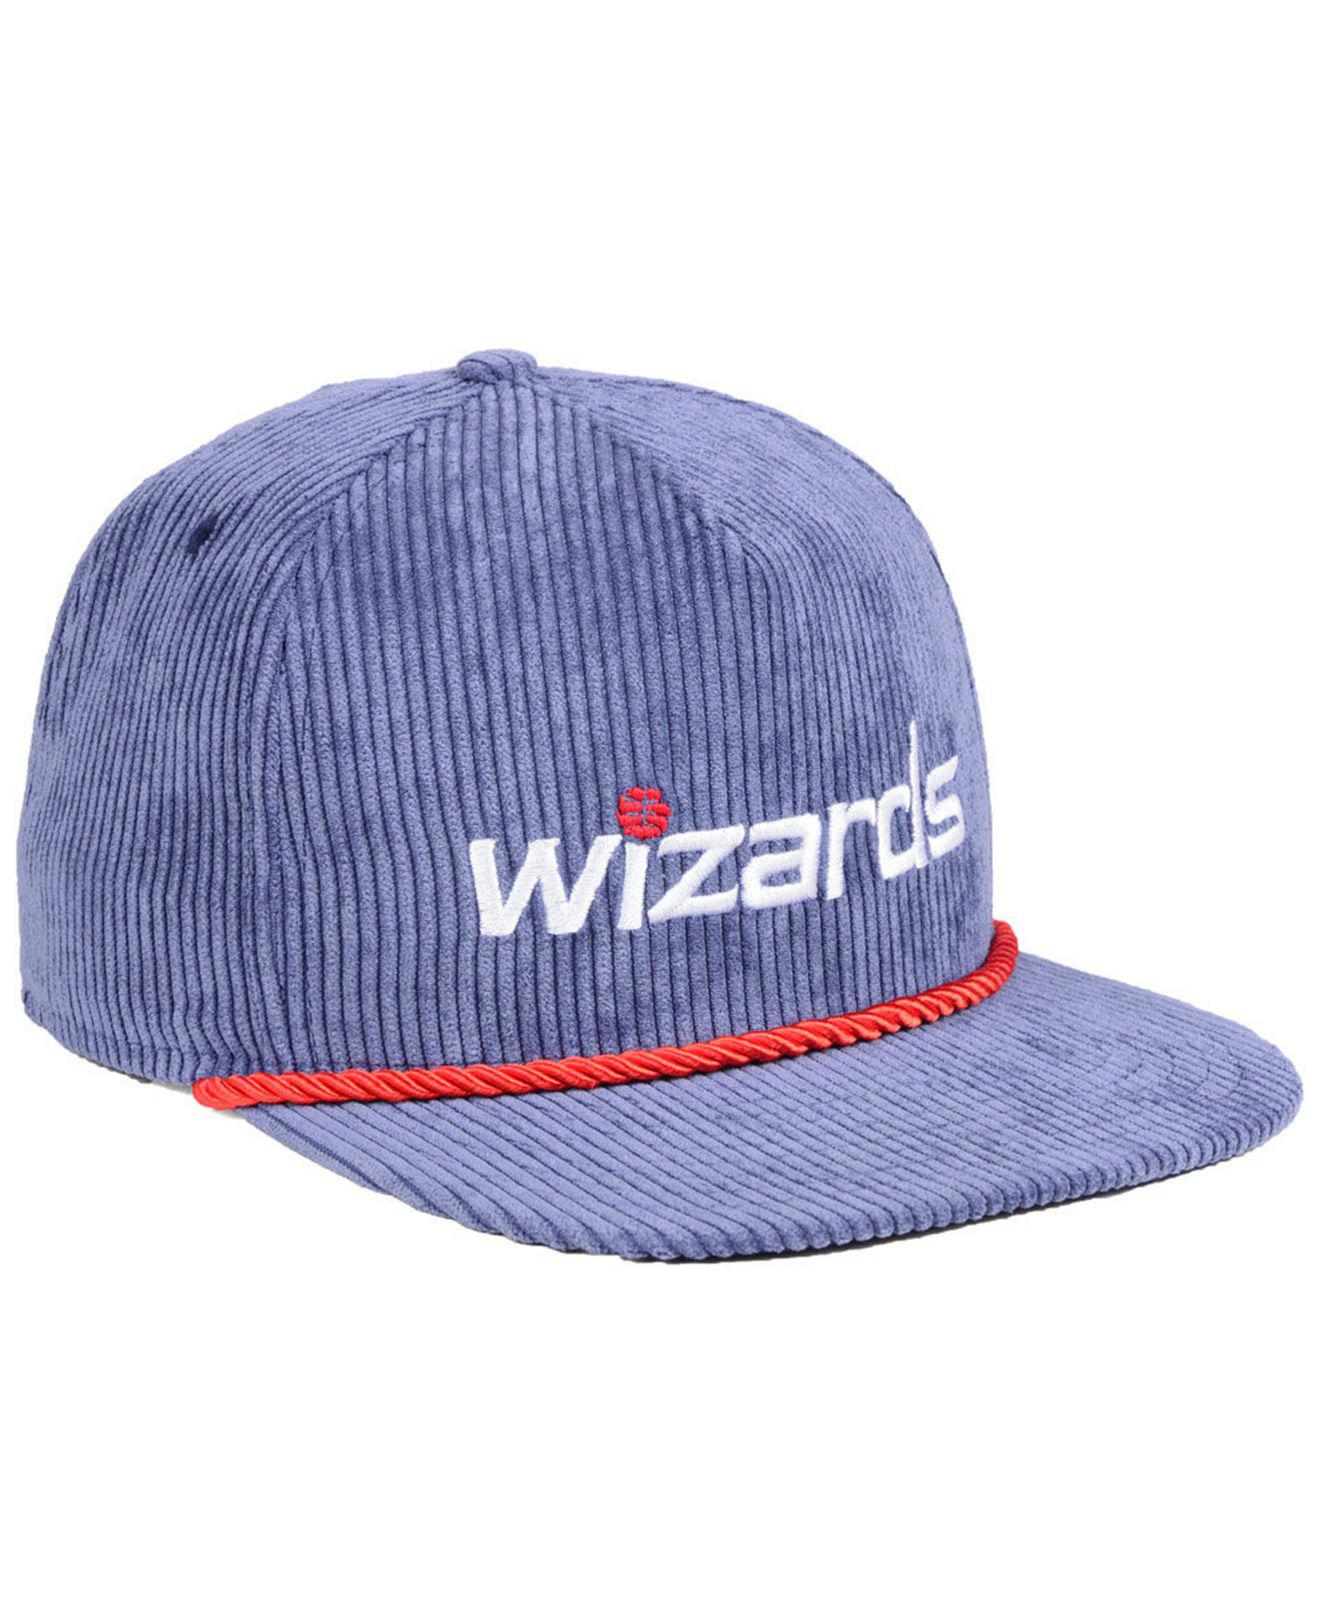 Lyst - KTZ Washington Wizards Hardwood Classic Nights Cords 9fifty ... 6cee9e1a2